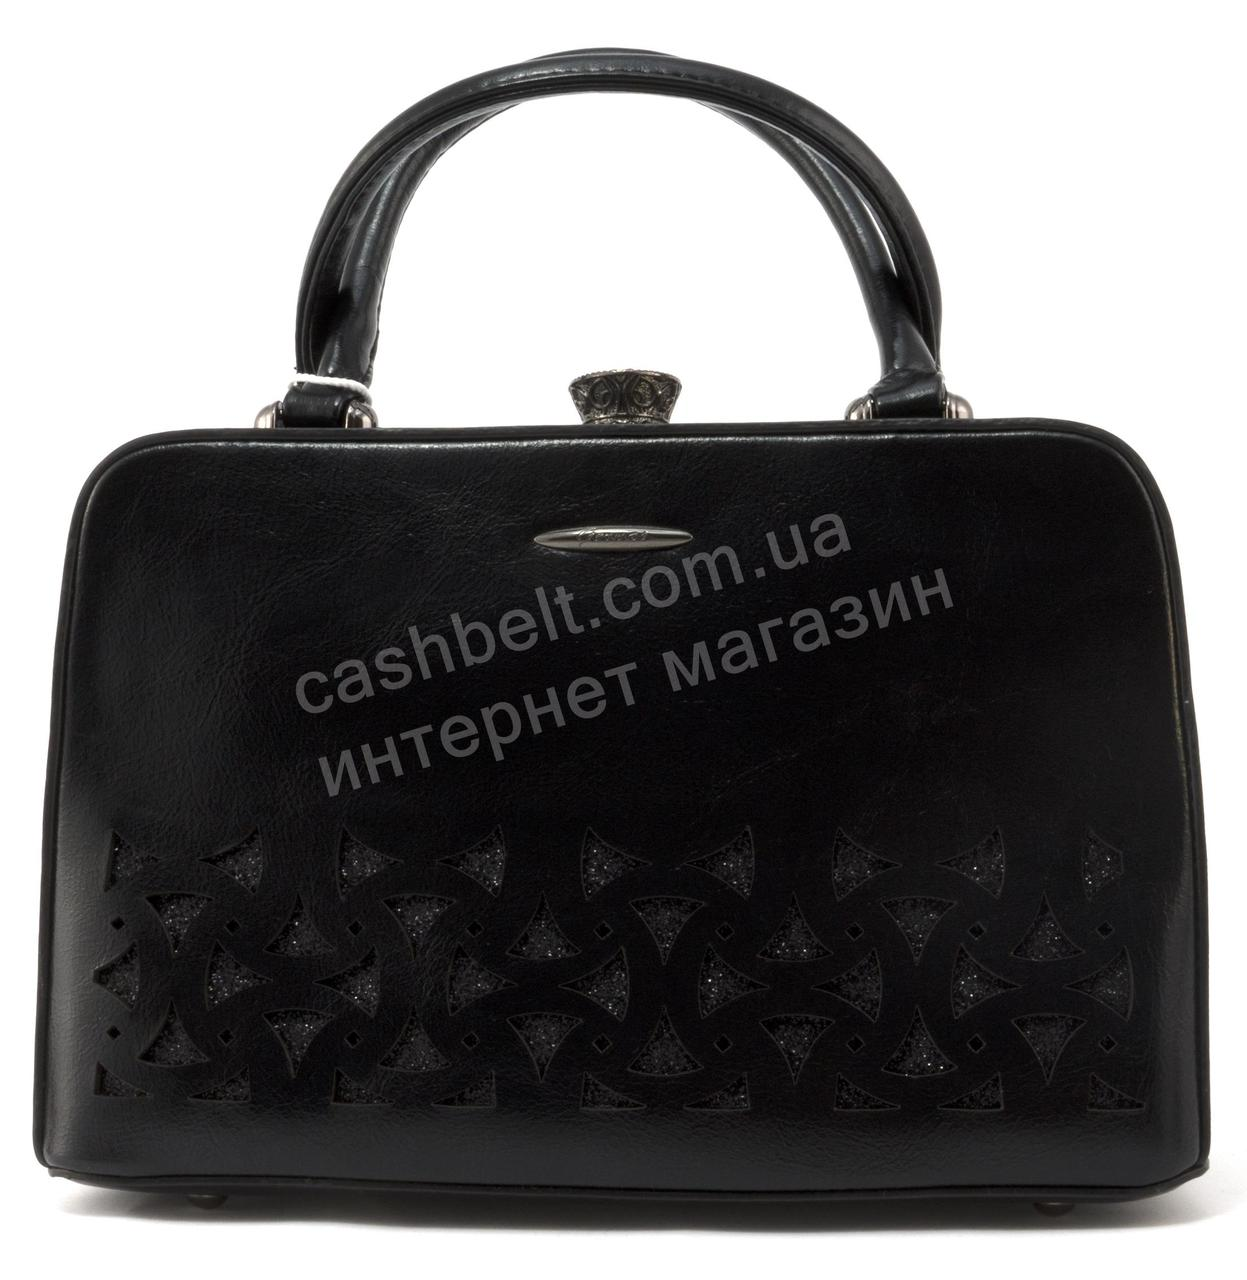 51f4552cddee Каркасная кожаная стильная прочная элегантная женская сумка GERNAS art.  G-173017 черная